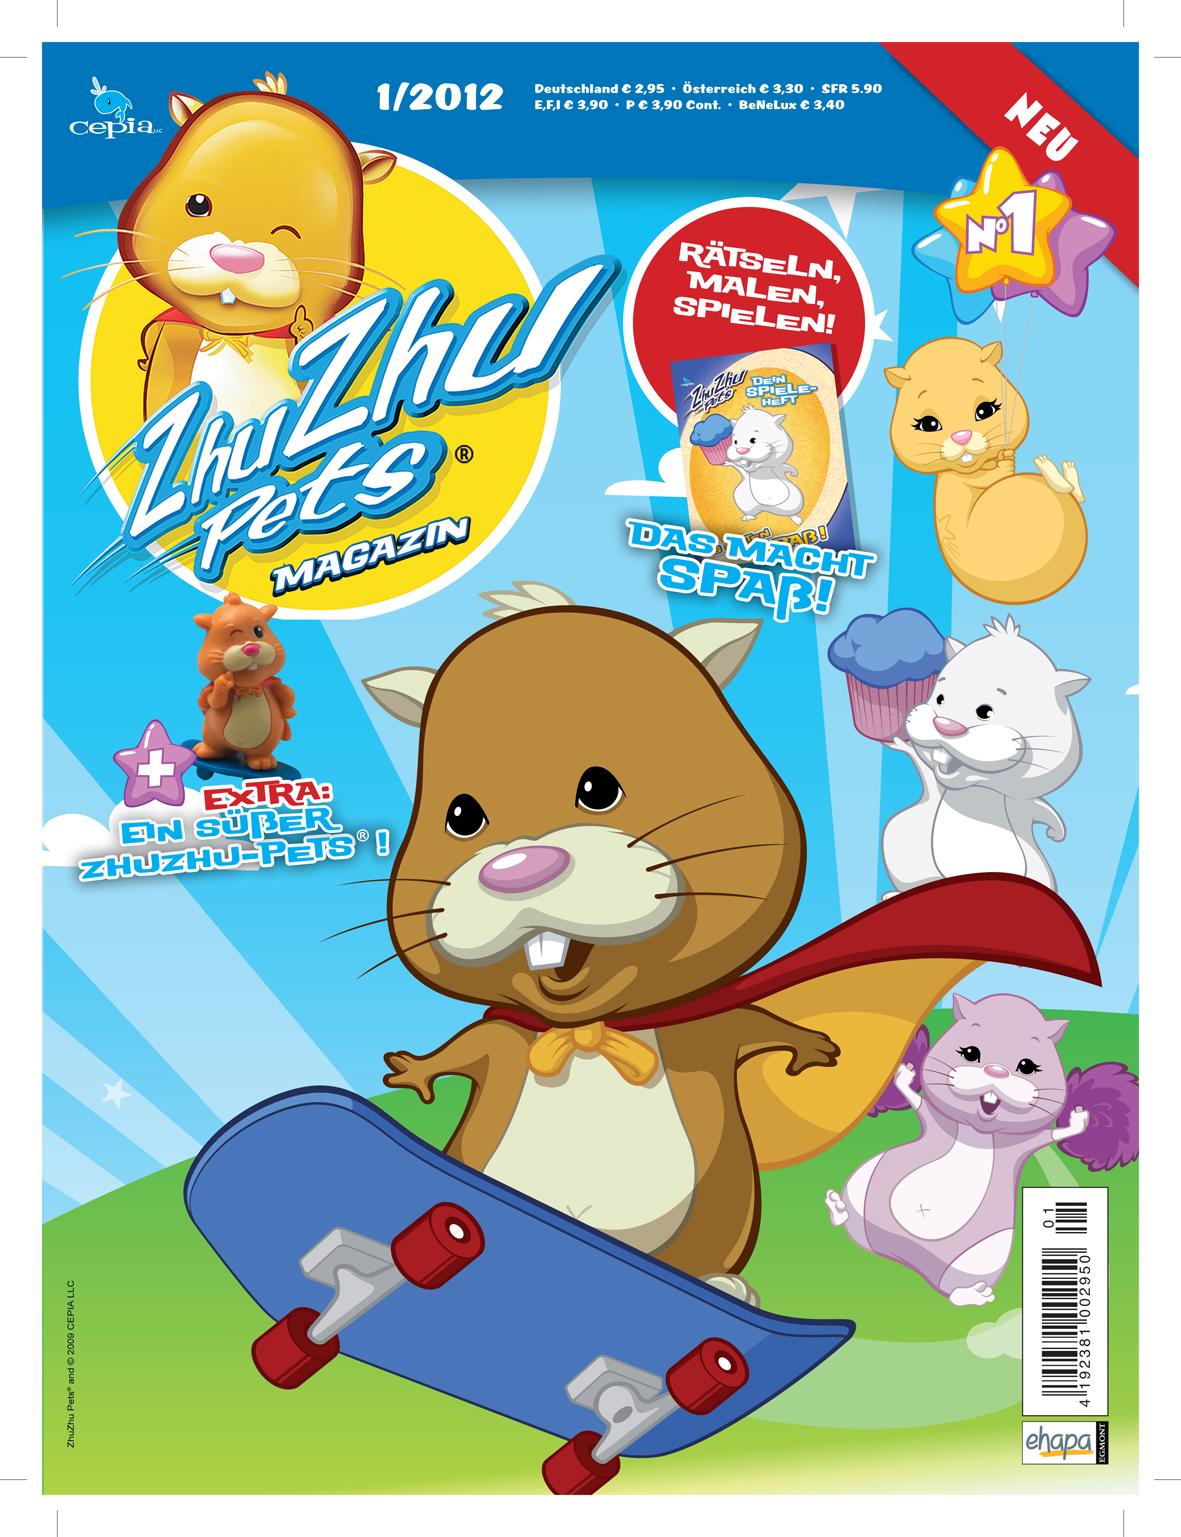 Egmont Ehapa Launcht Toy Story Magazin: Egmont Ehapa Möchte Mit Hamstern Kinderzimmer Erobern